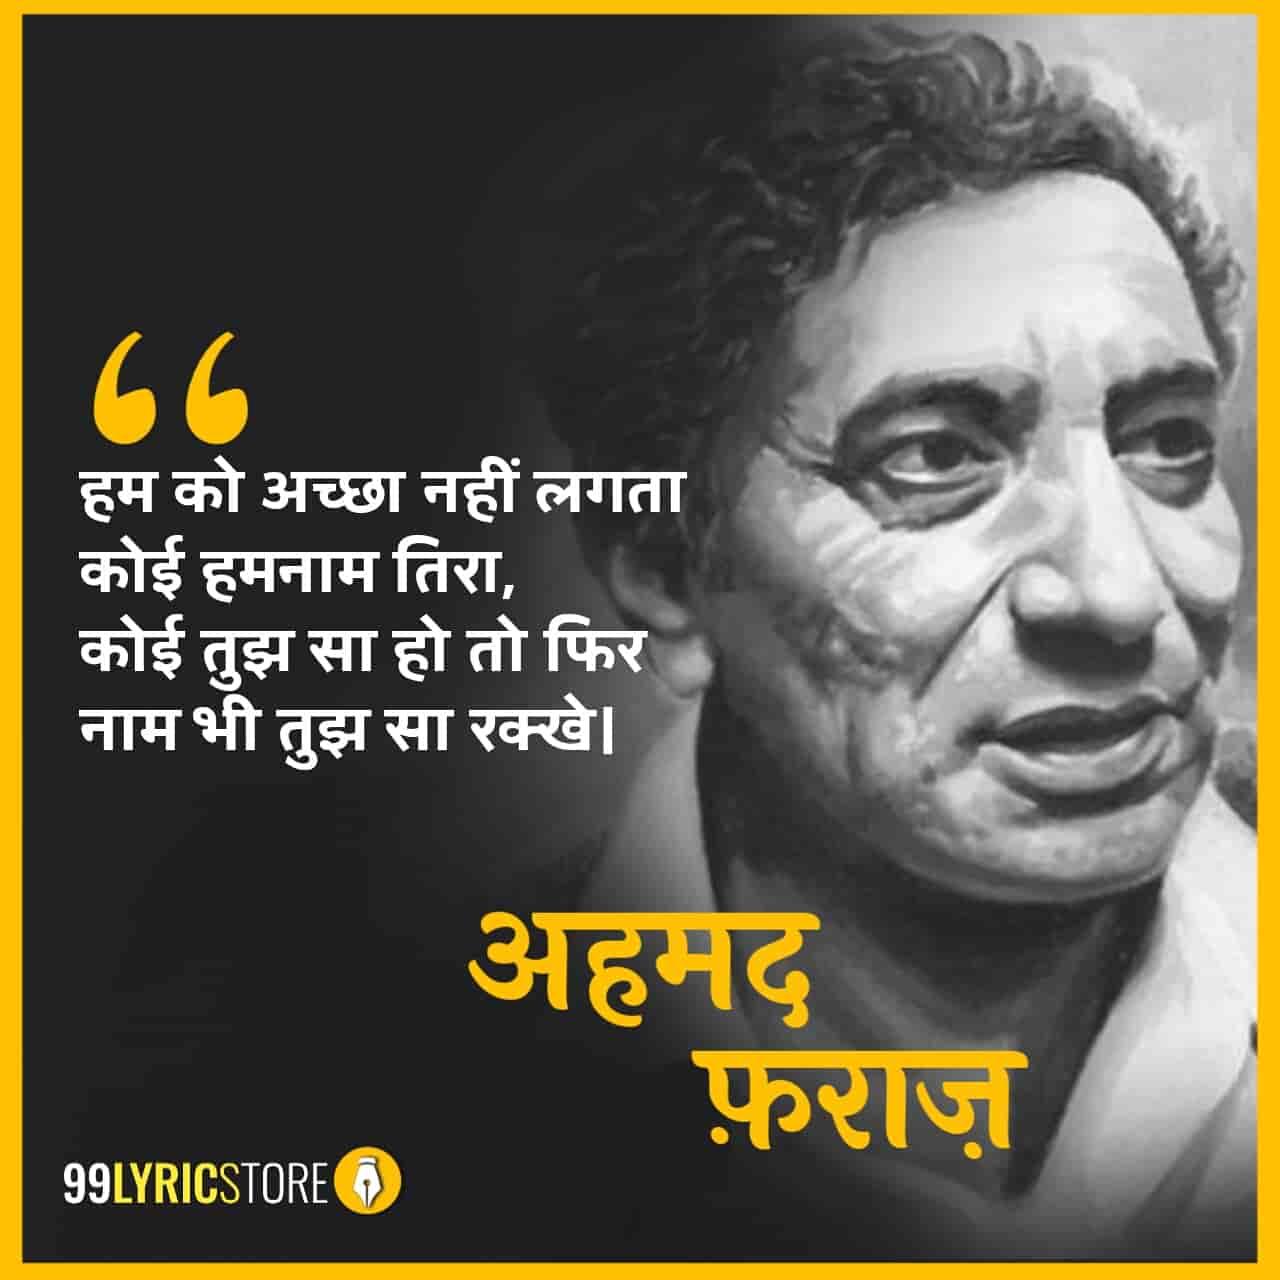 This beautiful ghazal 'Har Koi Dil Ki Hatheli Pe Hai Sahra Rakkhe' has written by Ahmad Faraz.